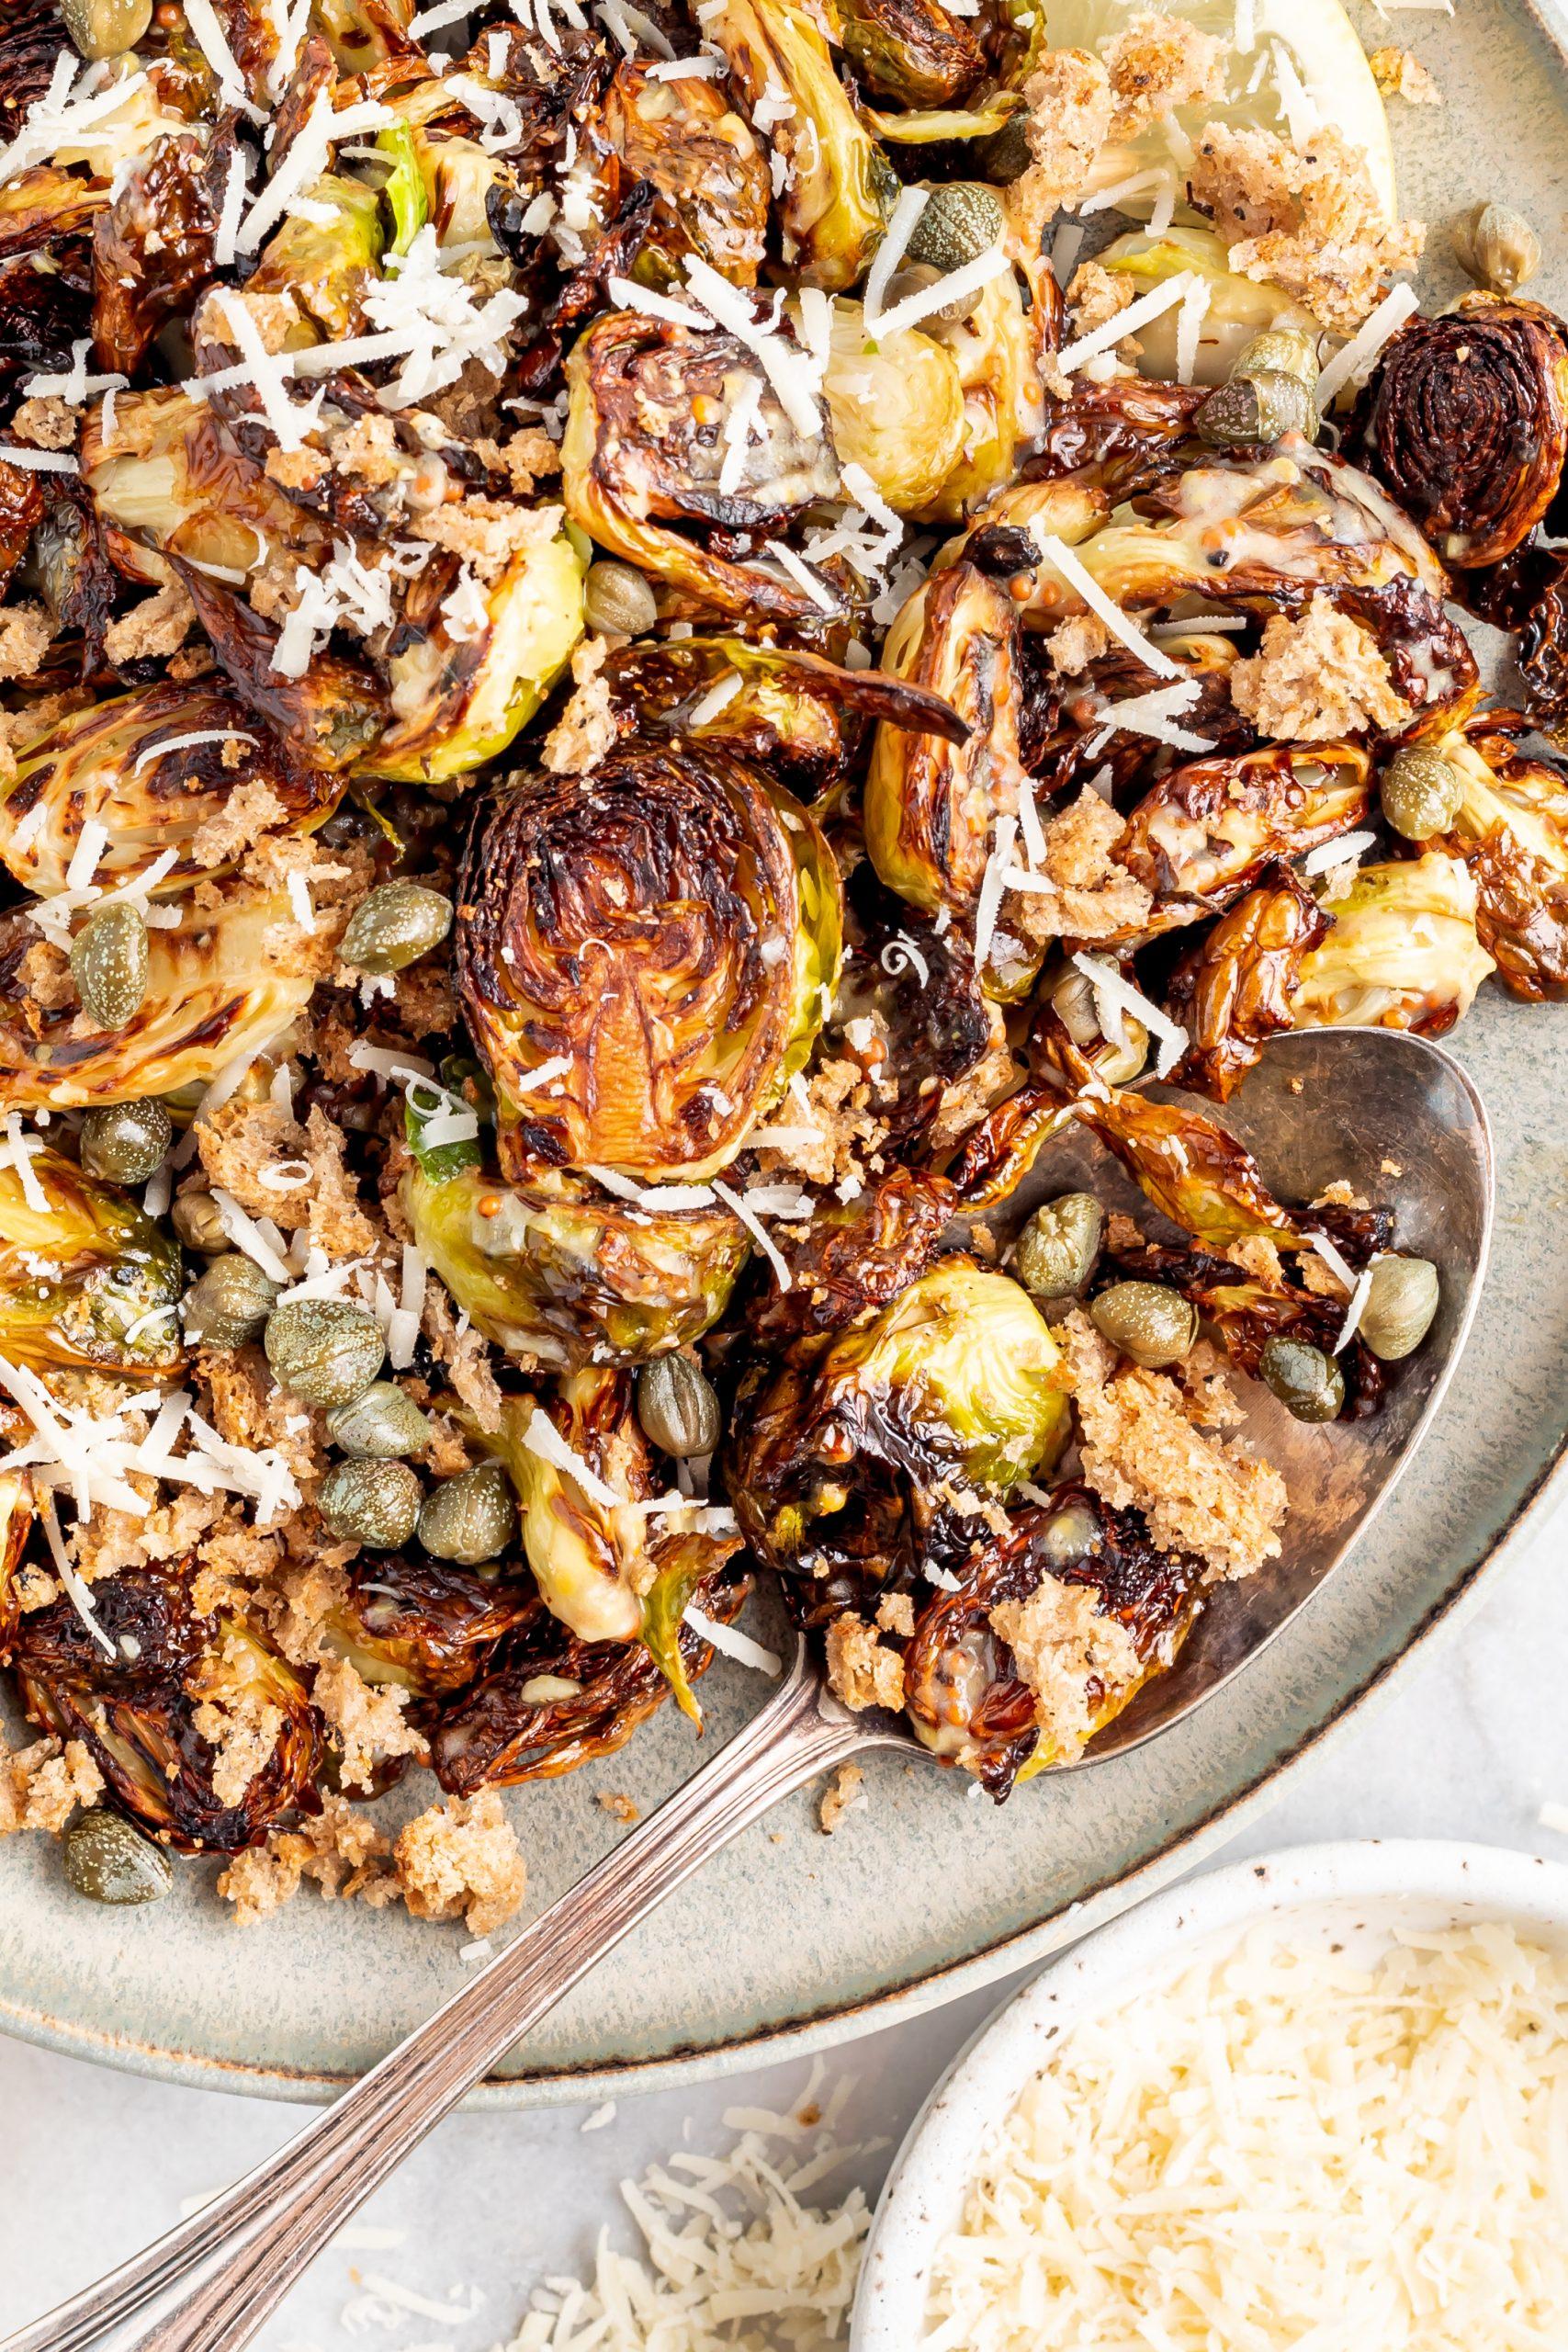 bowl of roasted veggies